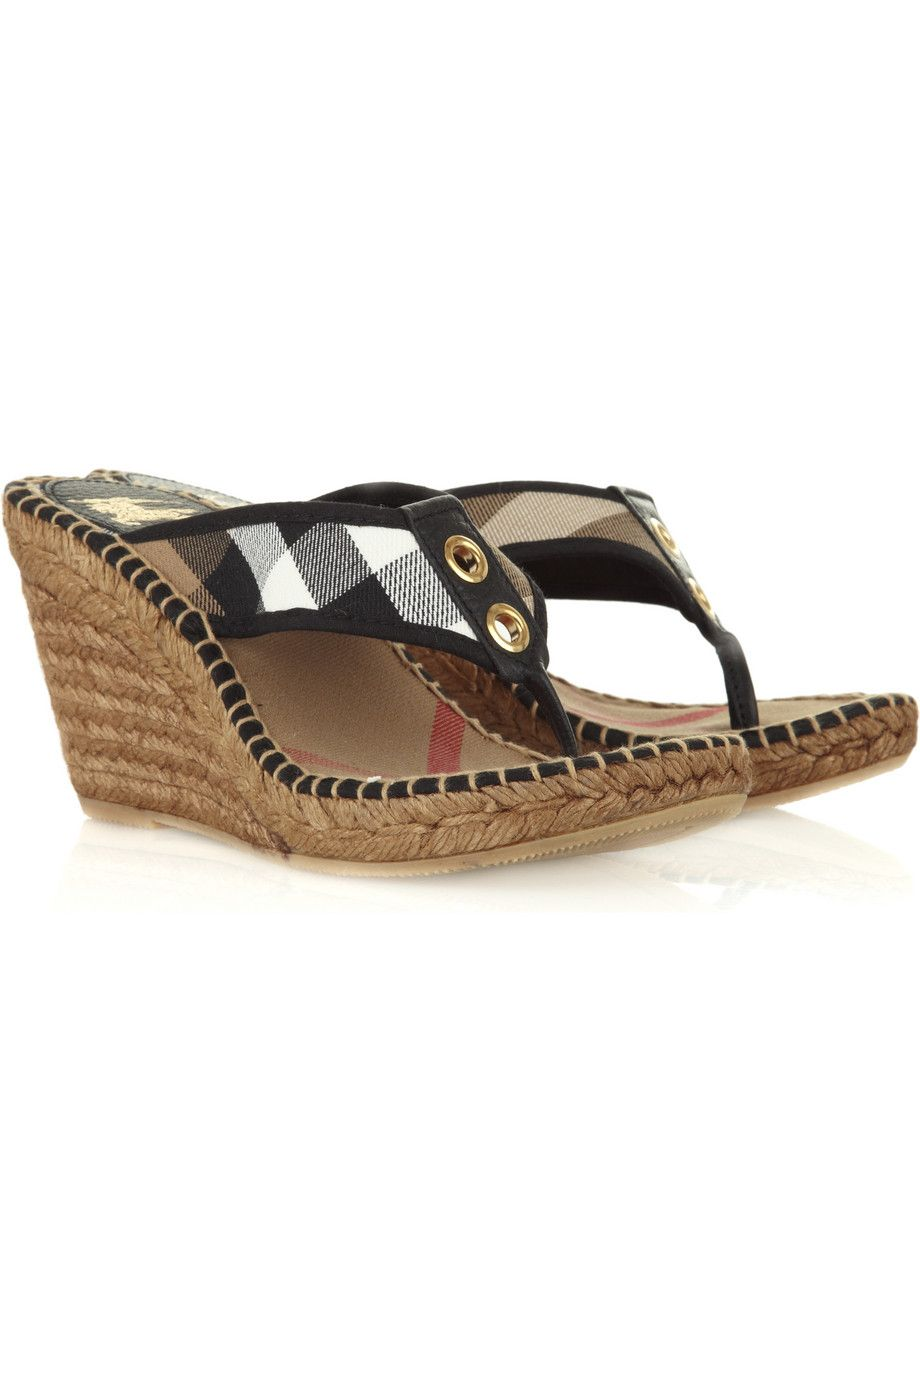 Espadrille wedge sandals   Burberry